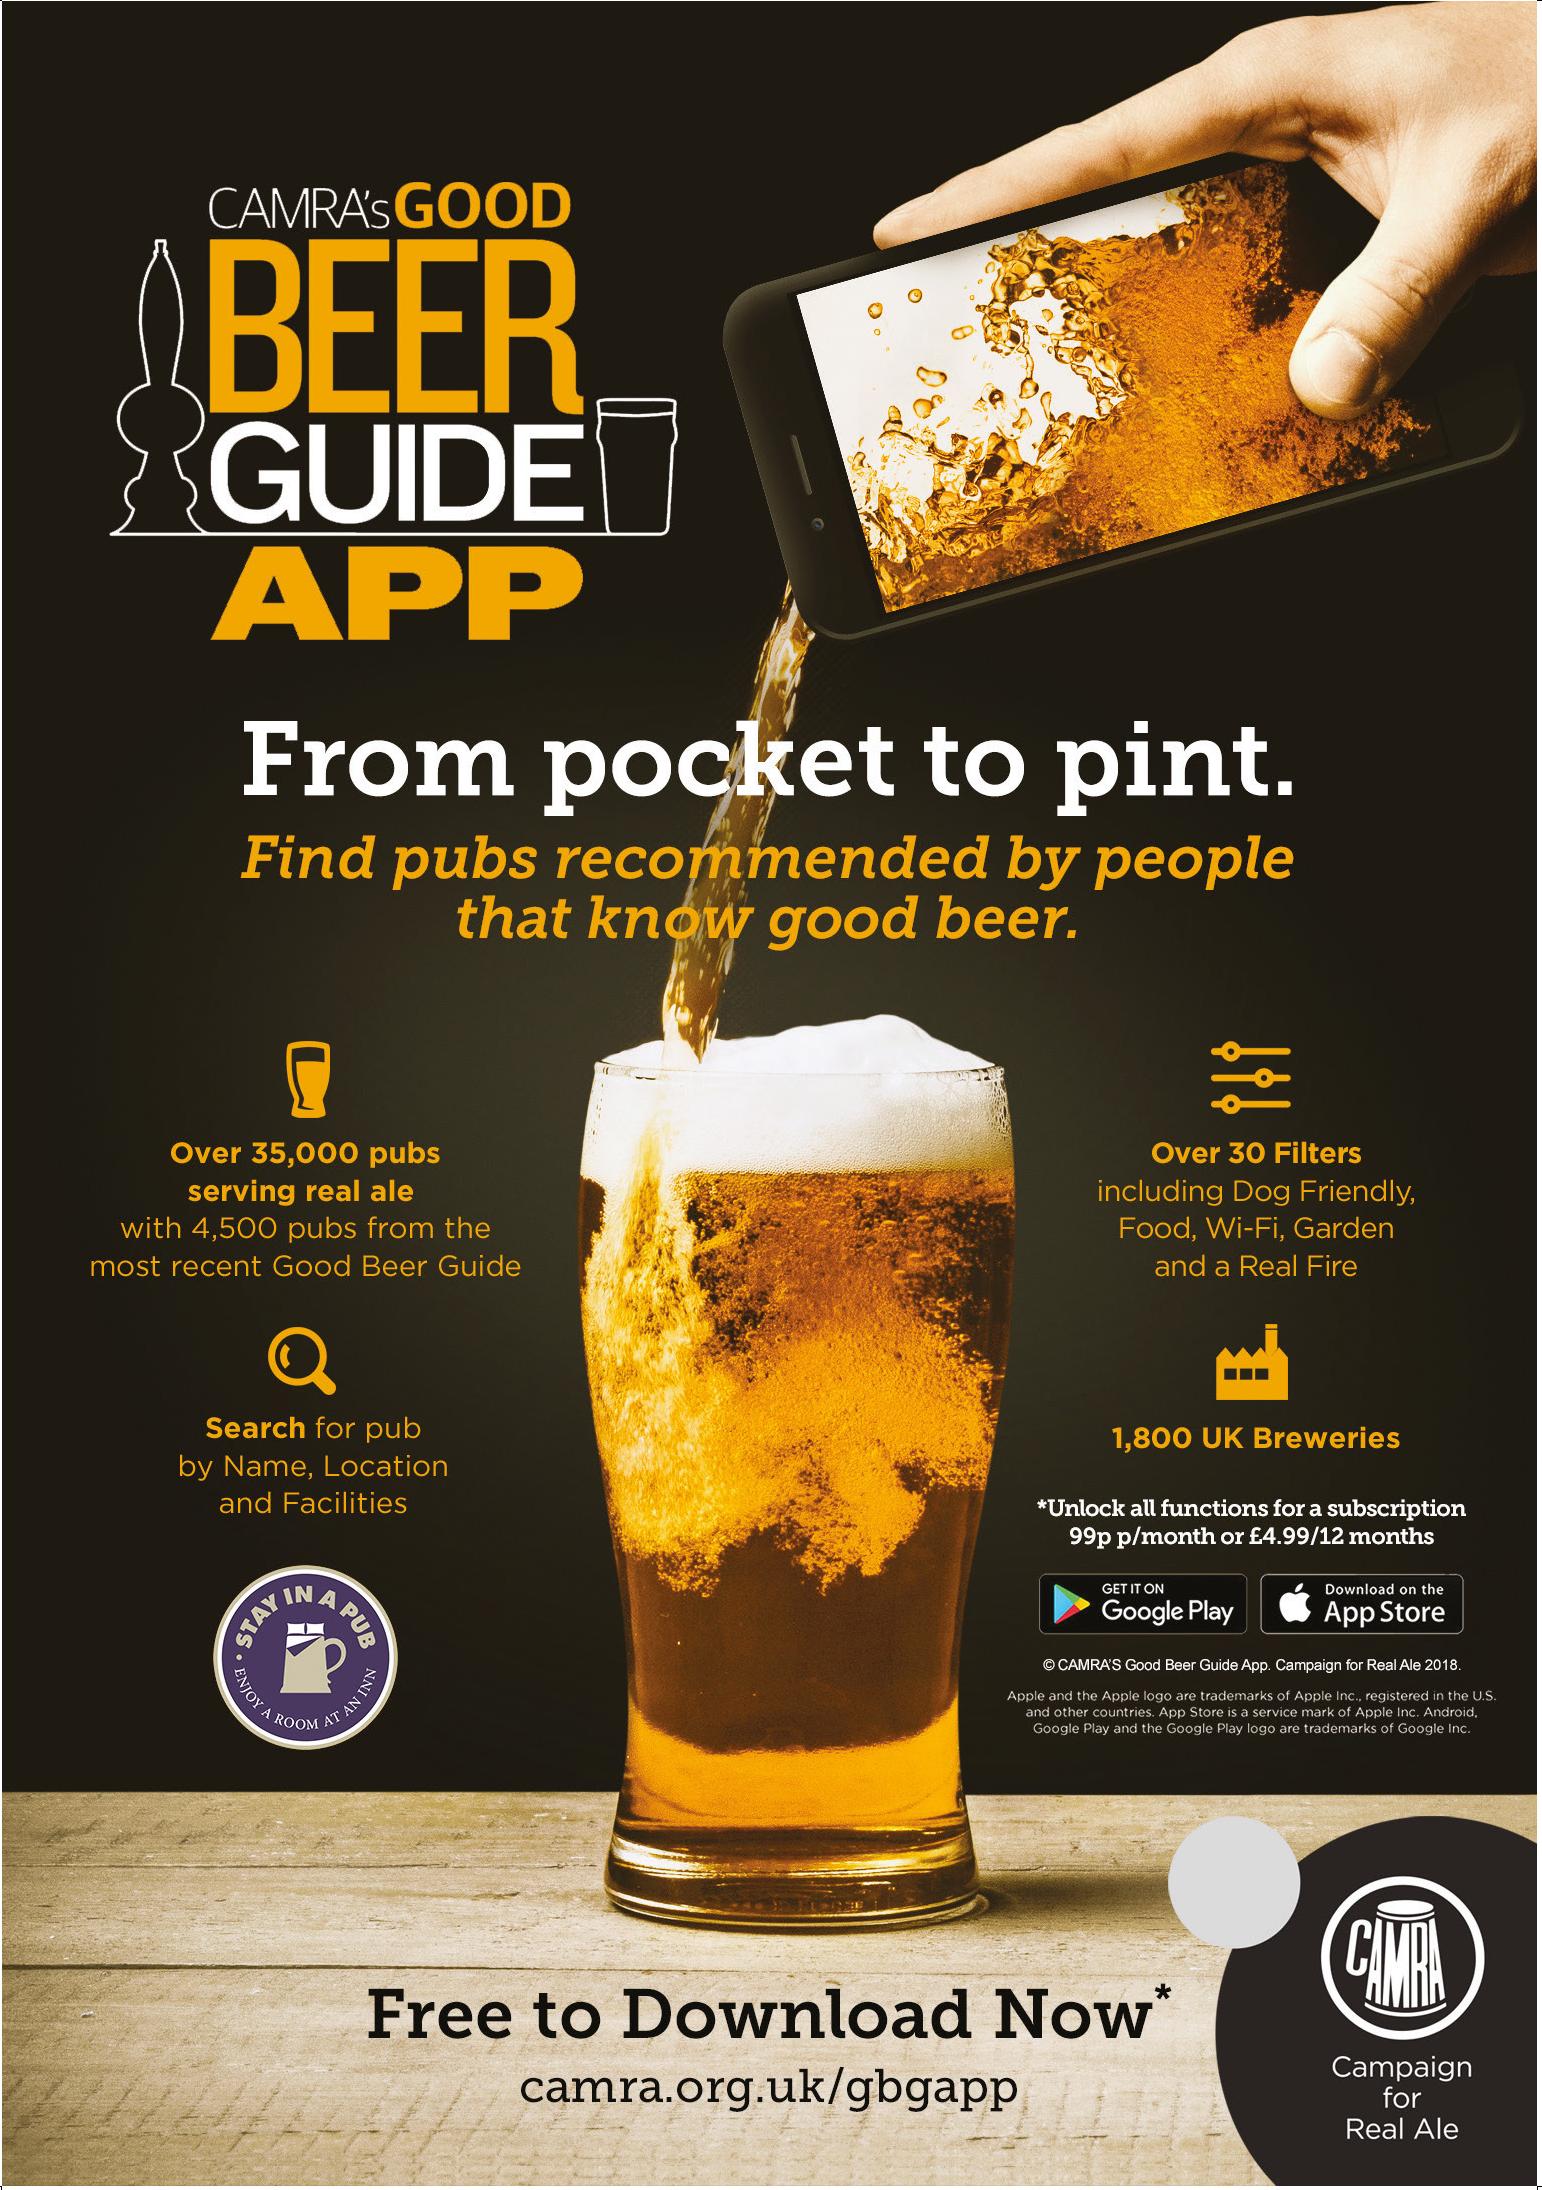 CAMRA's Good Beer Guide App